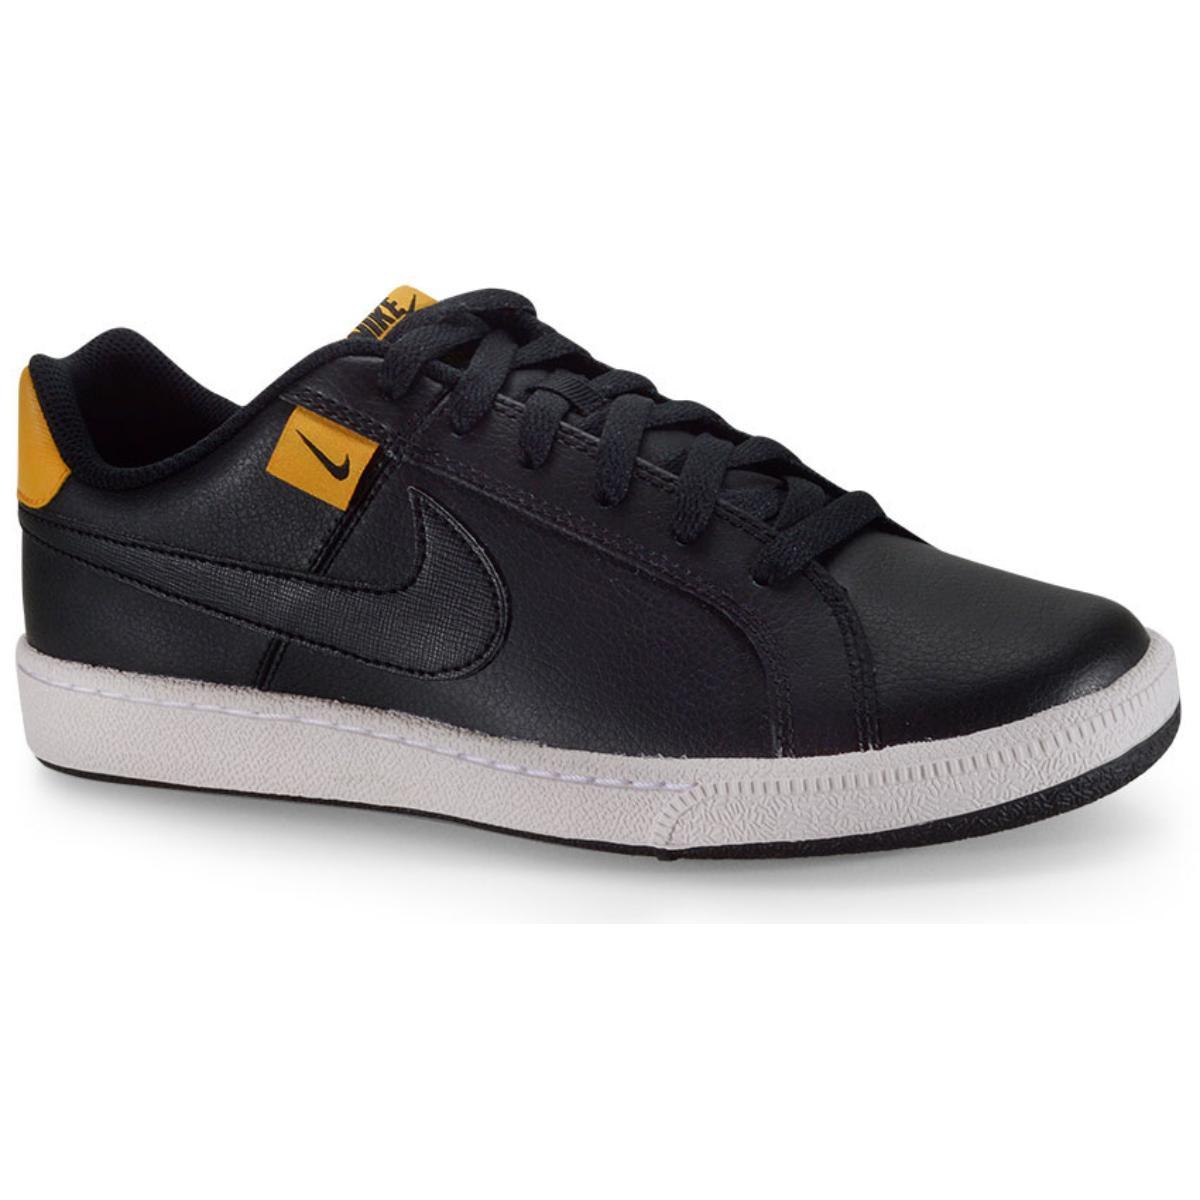 Tênis Masculino Nike Cj9263-002 Court Royale Tab Preto/branco